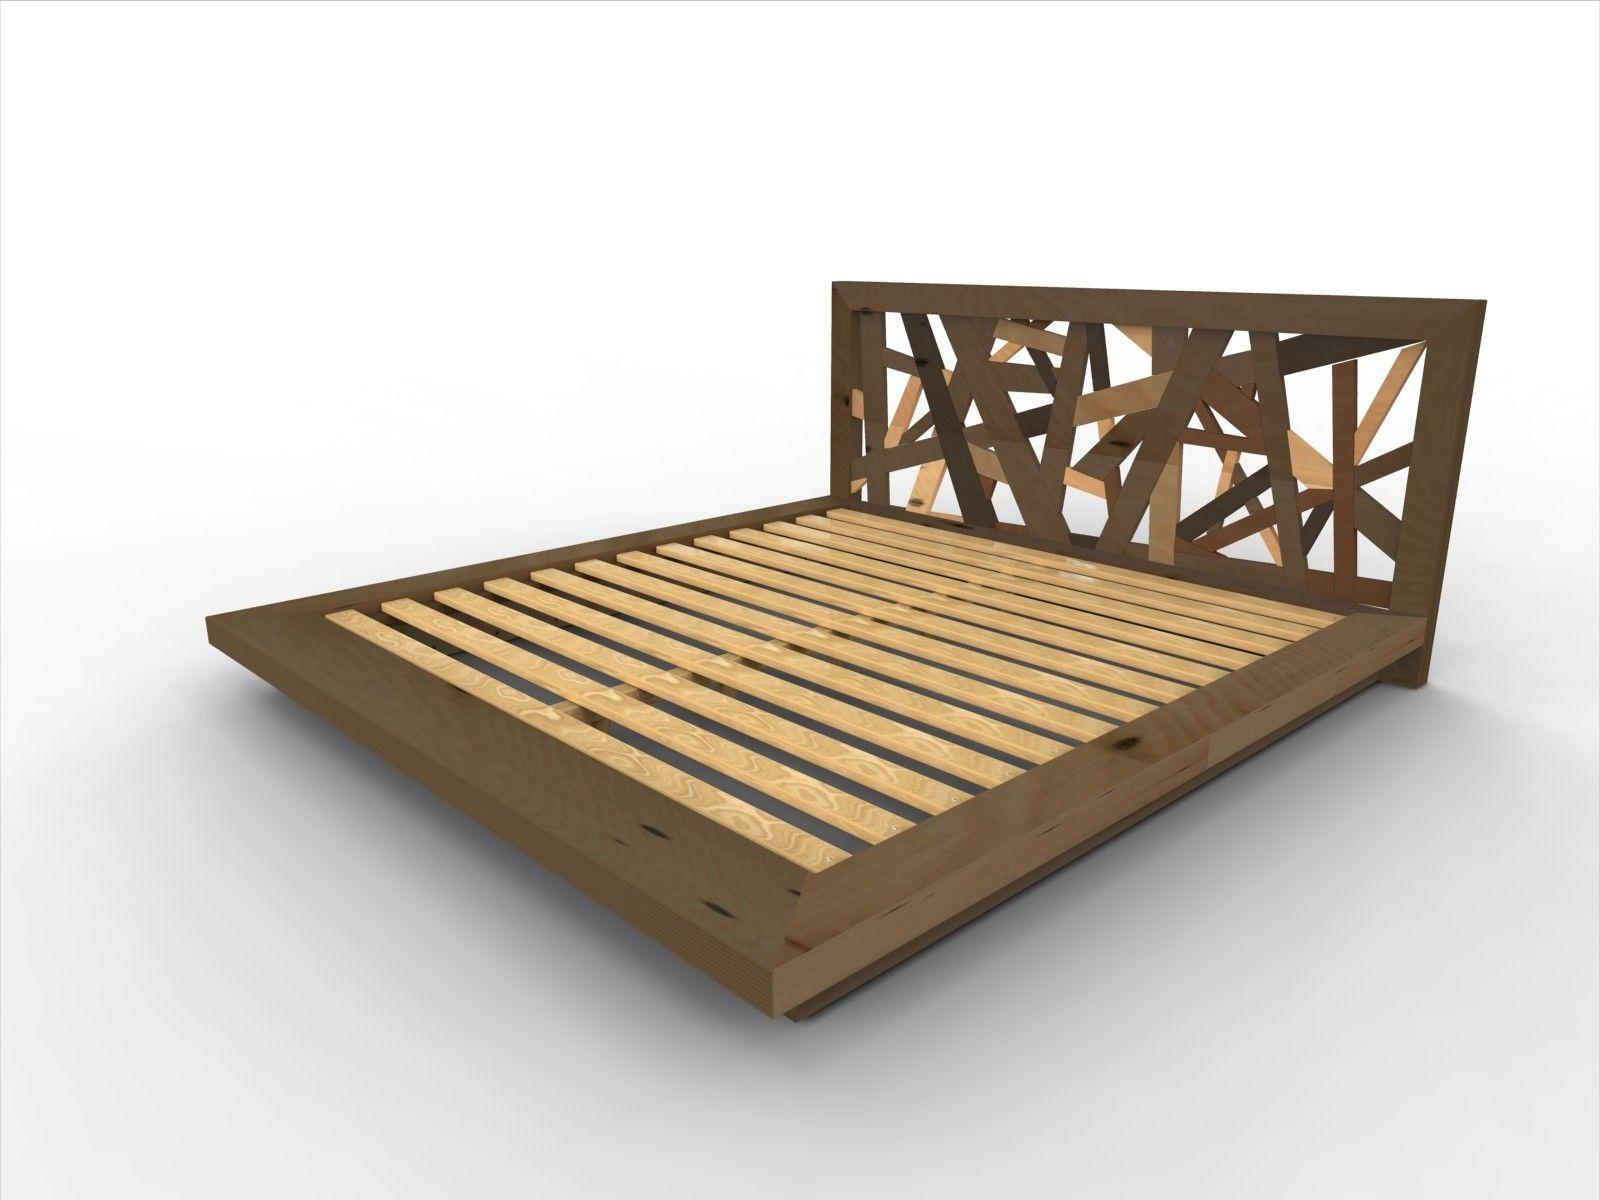 furniture-bedroom-queen-brown-wooden-platform-king-bed-frame-plus ...